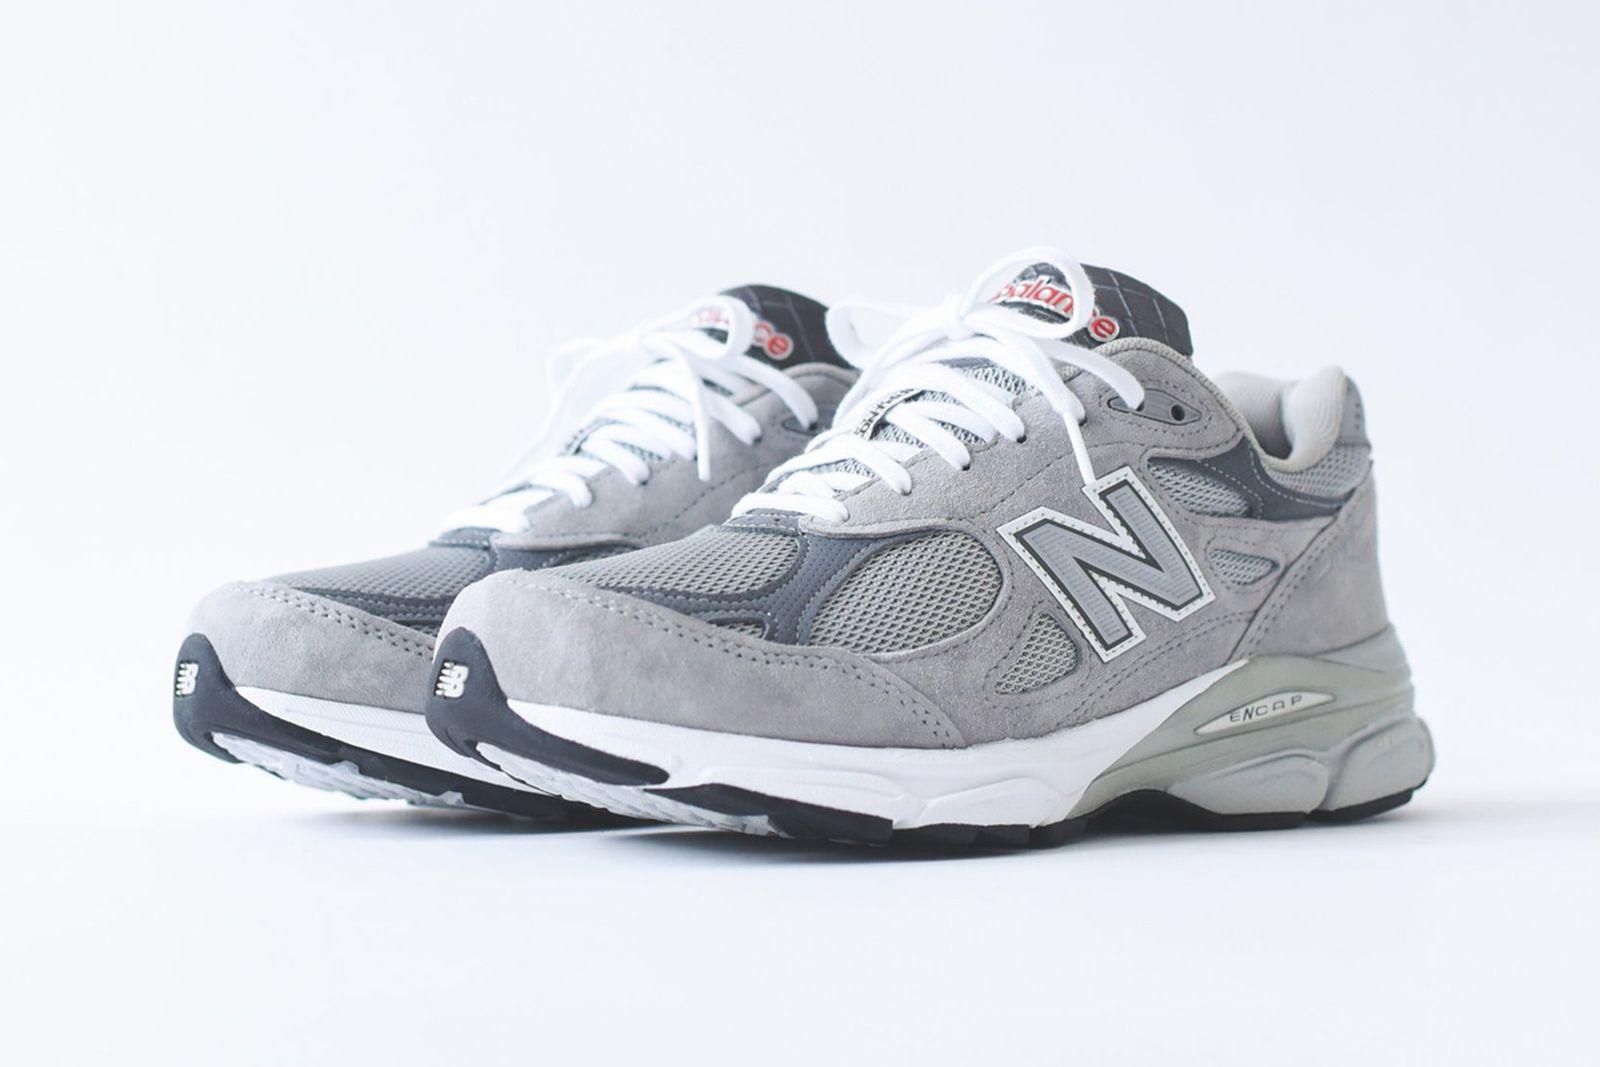 new balance 990v3 grey white release date price kith ronnie fieg